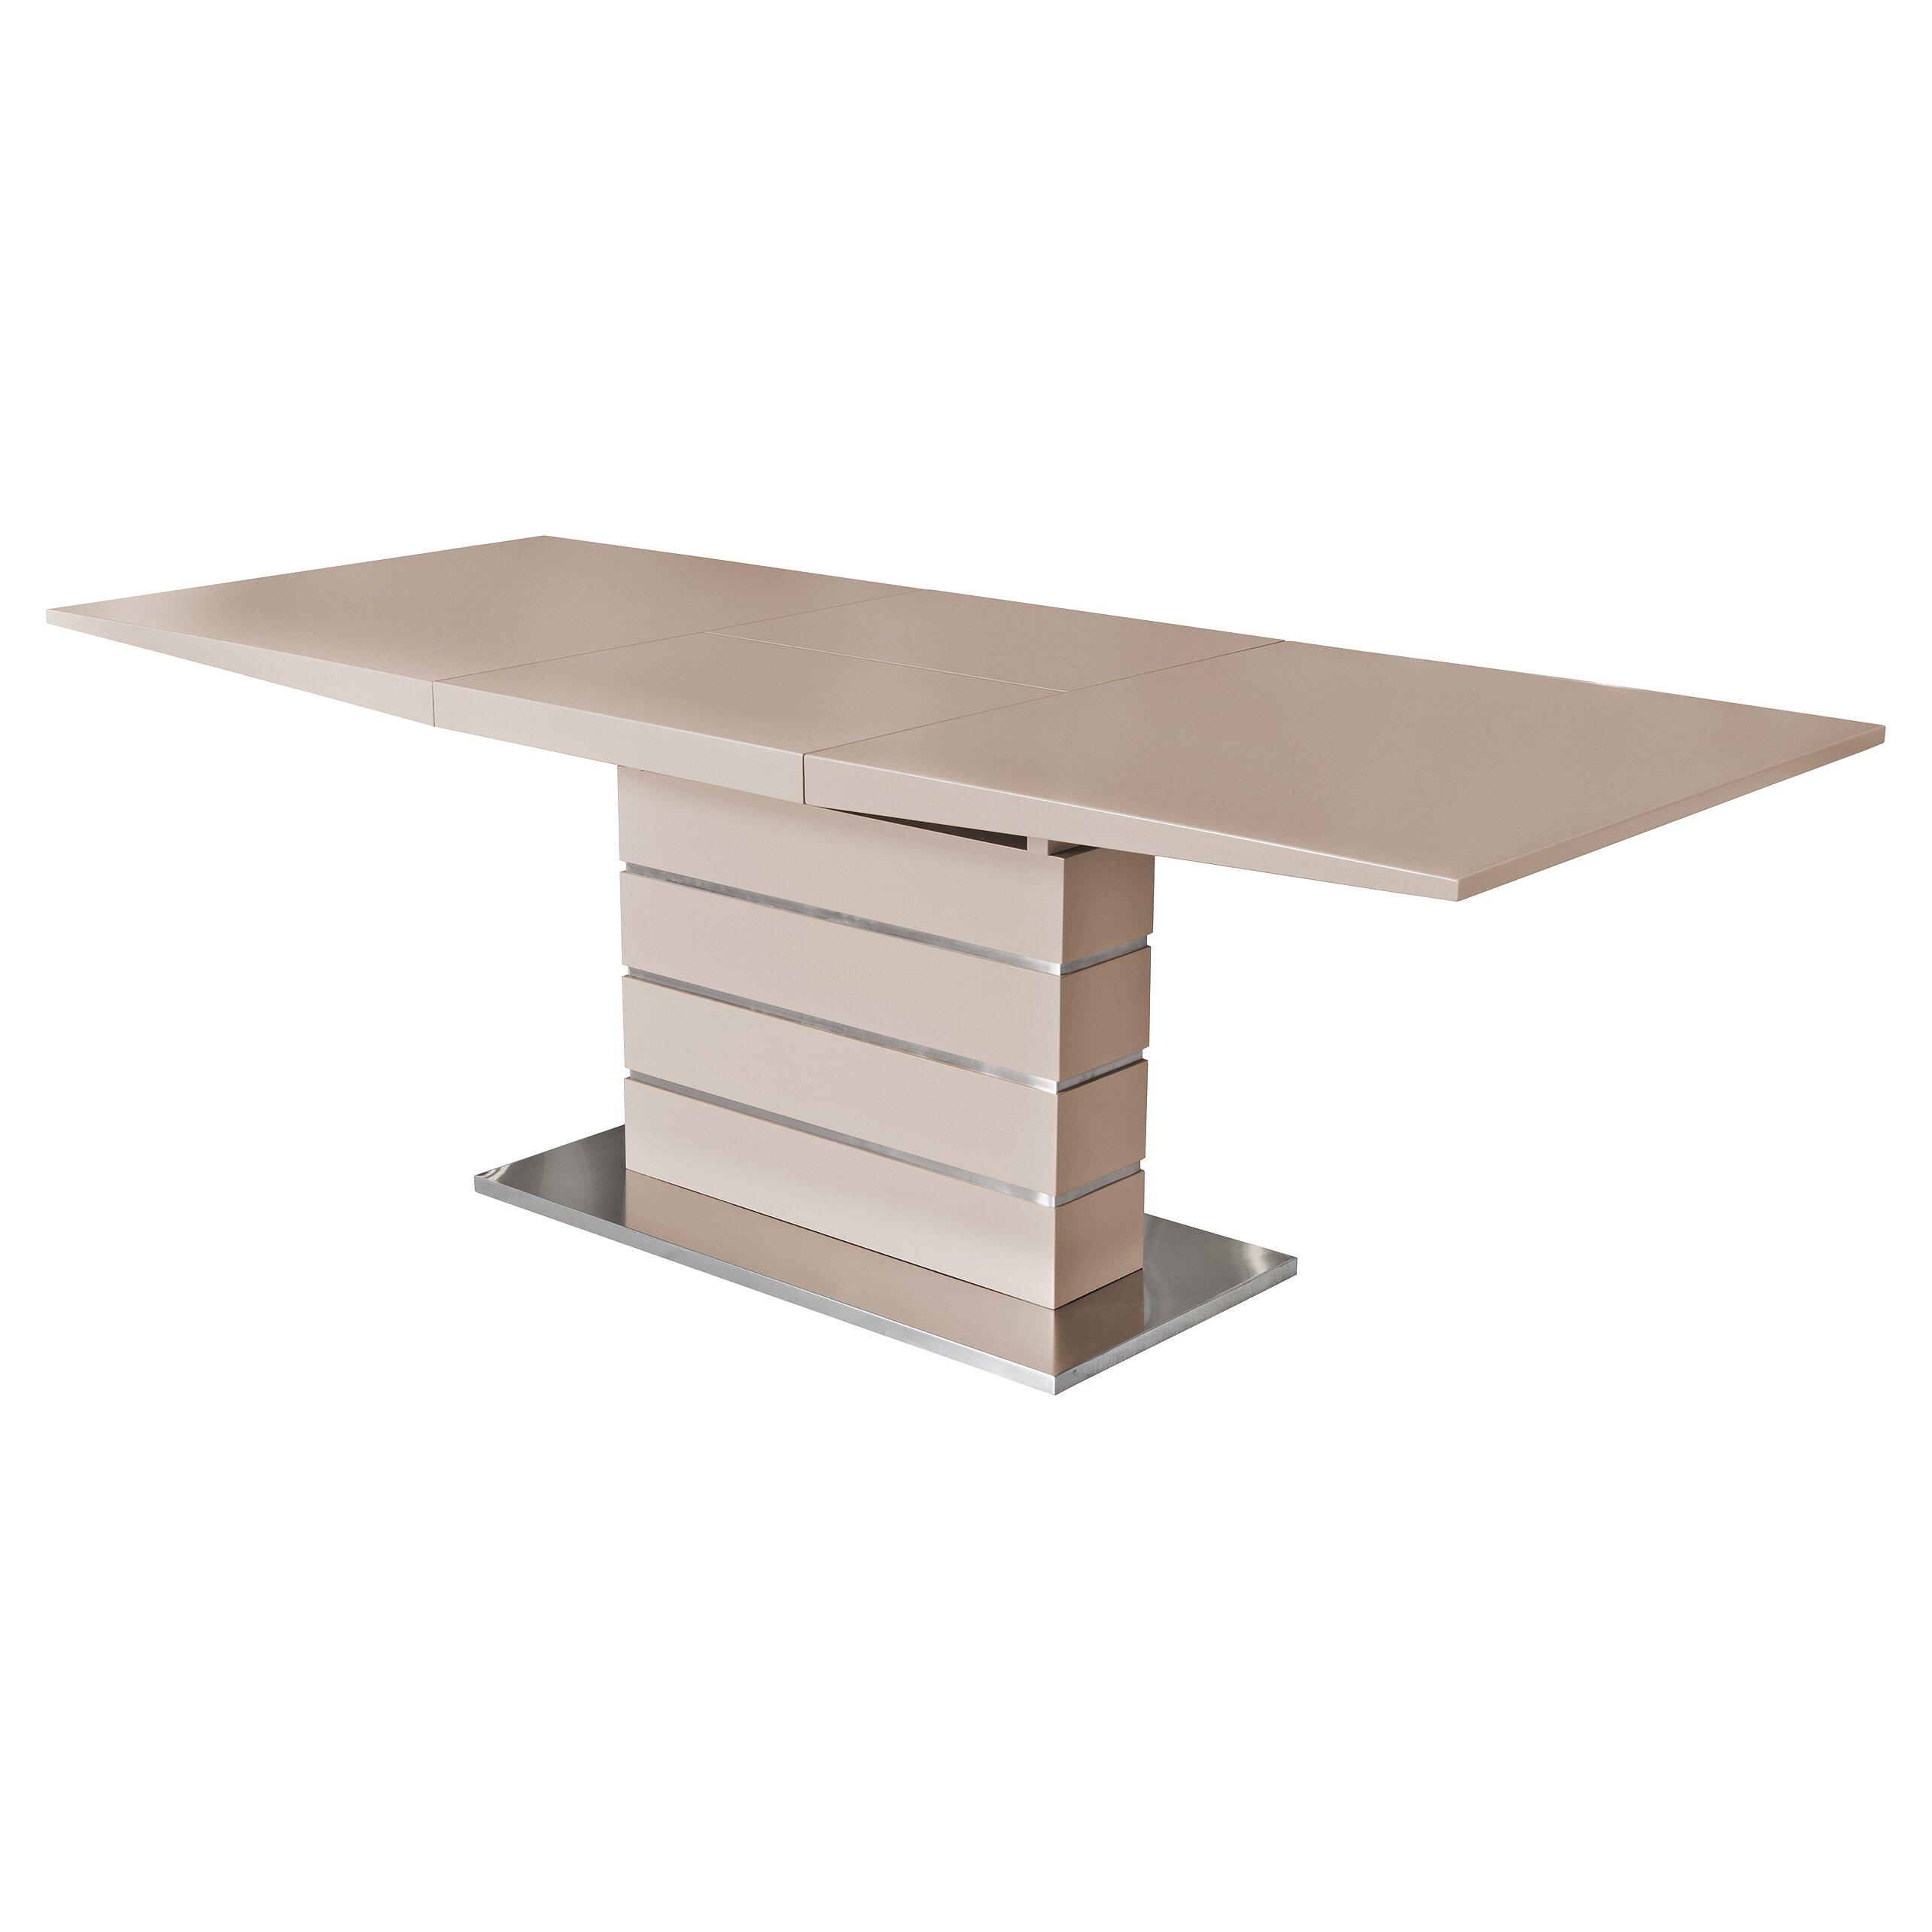 dCor design Breisach Extendable Dining Table Wayfair UK : dCor design Breisach Extendable Dining Table from www.wayfair.co.uk size 2567 x 2567 jpeg 257kB